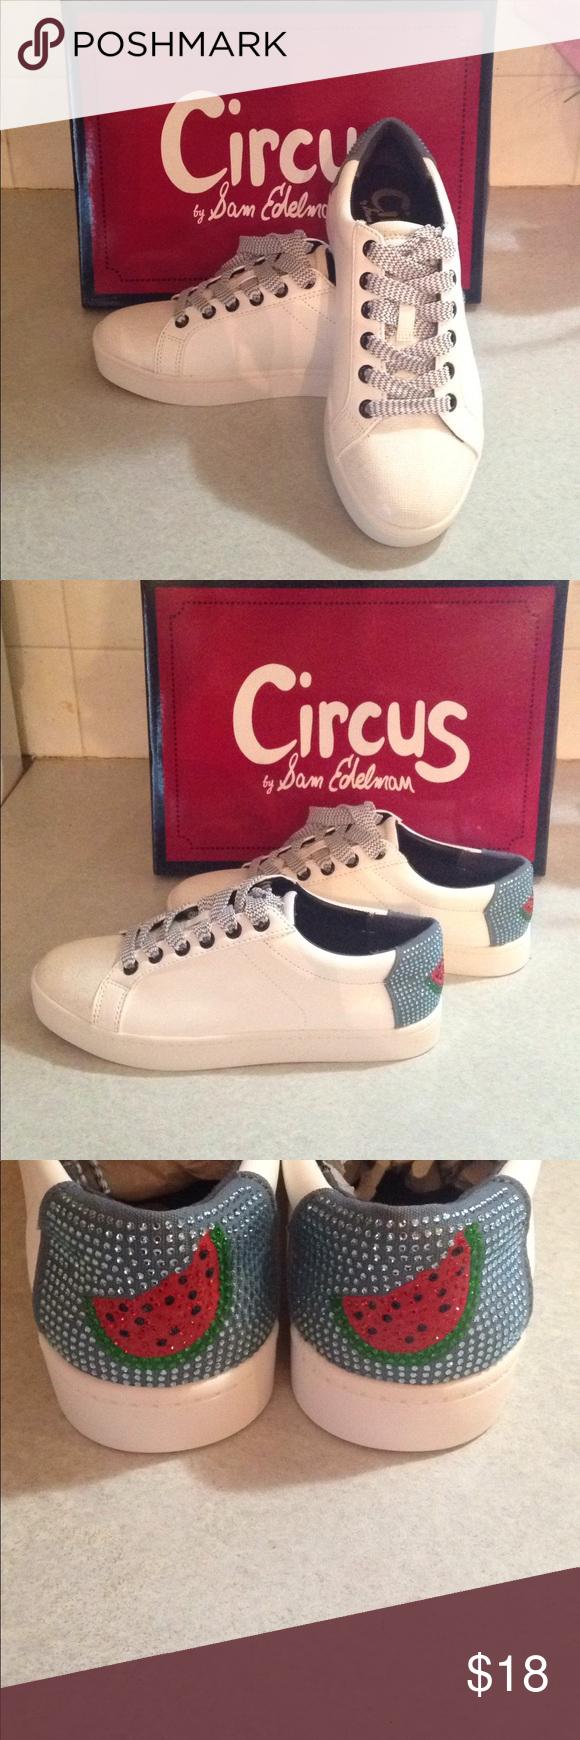 Circus brand tennis shoes   Tennis